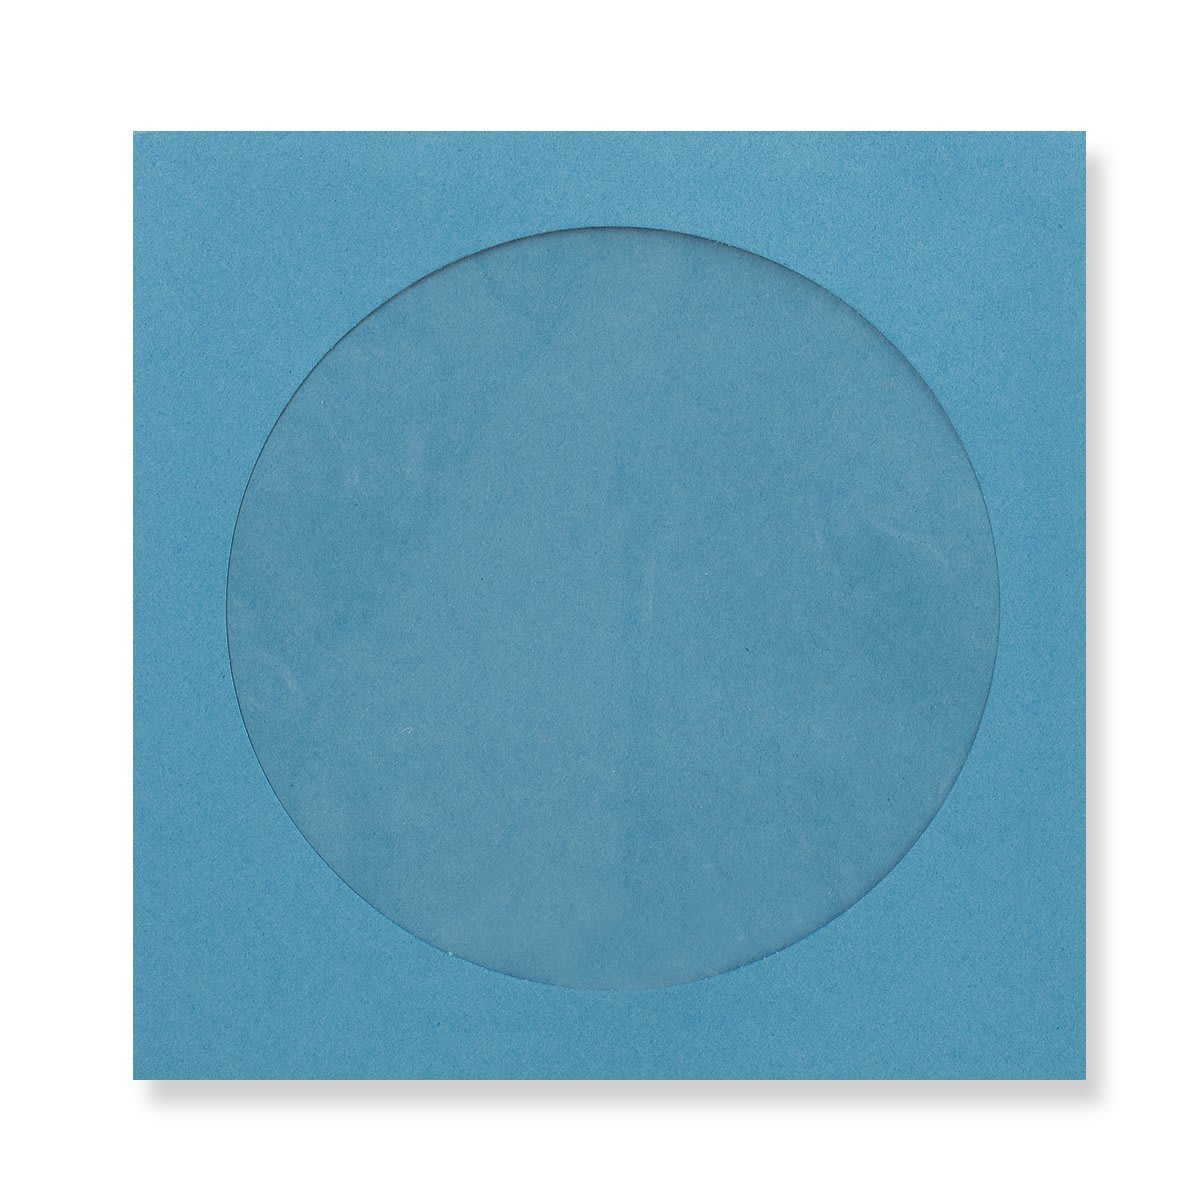 85 x 85mm BLUE MINI CD WINDOW ENVELOPES